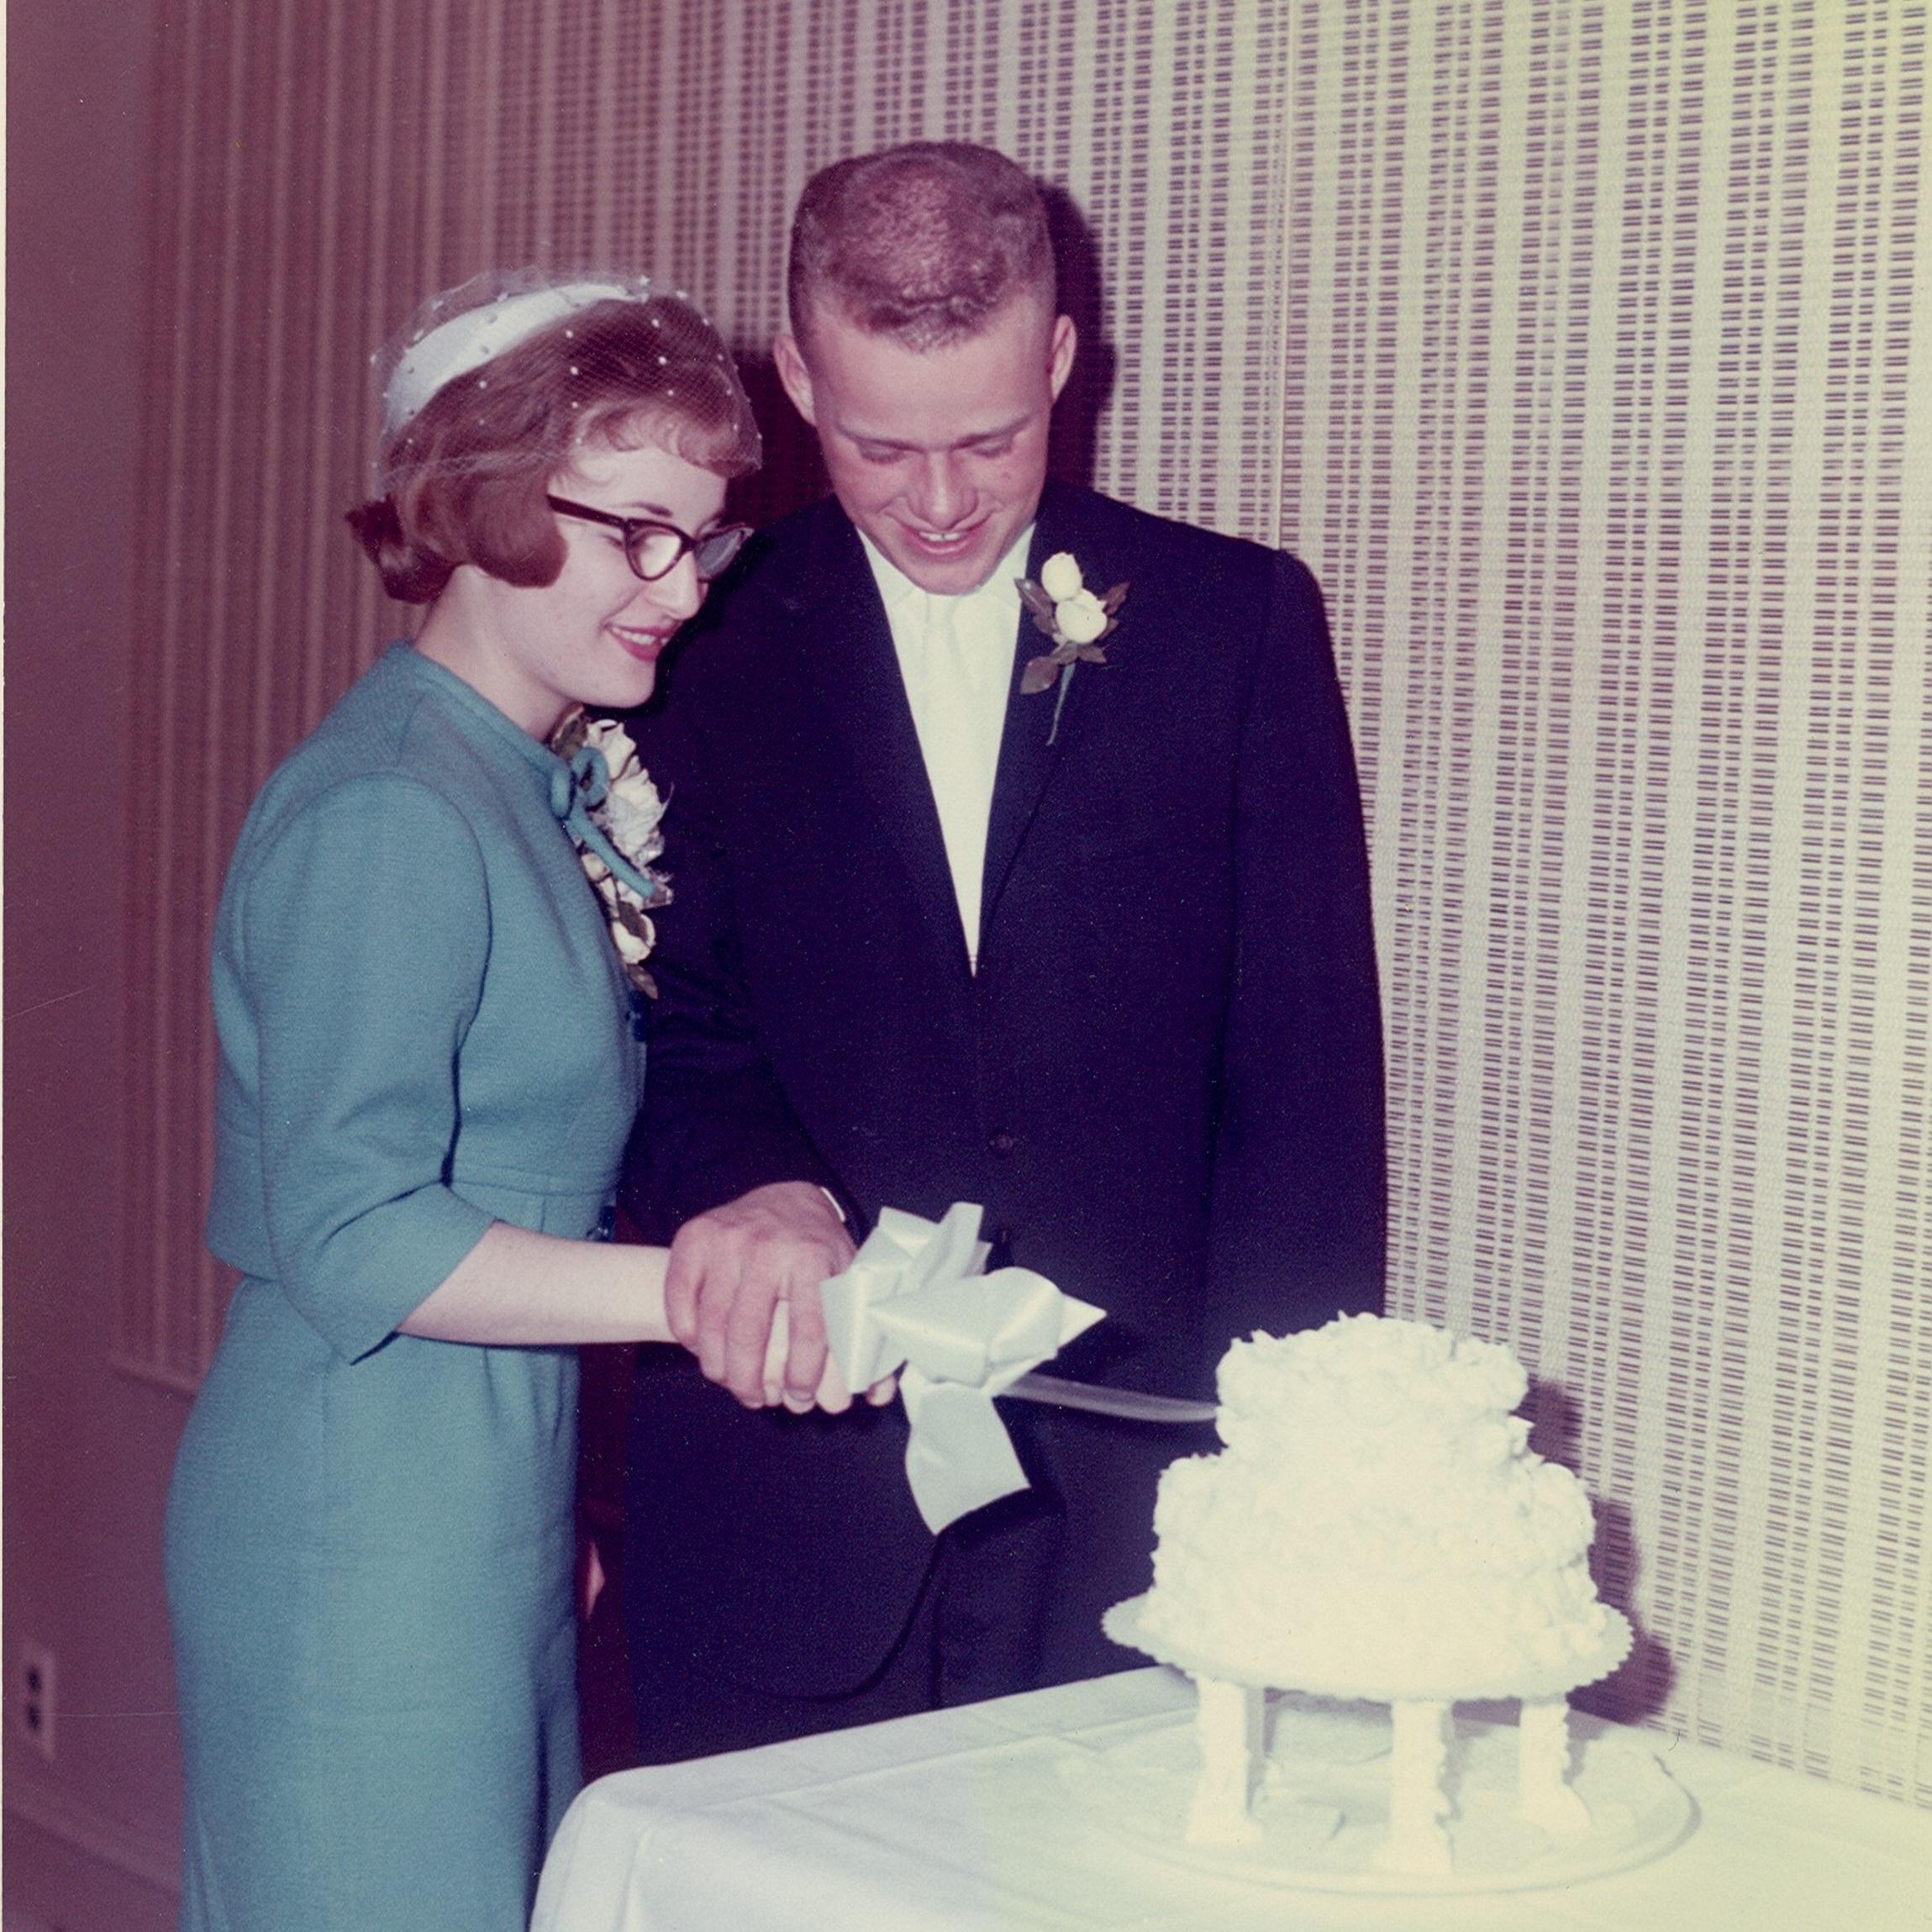 1962 - Ed married Minette (nee: Sprehn) and they had 4 children: Linette, Eddie (Jr.), Craig & Colette.